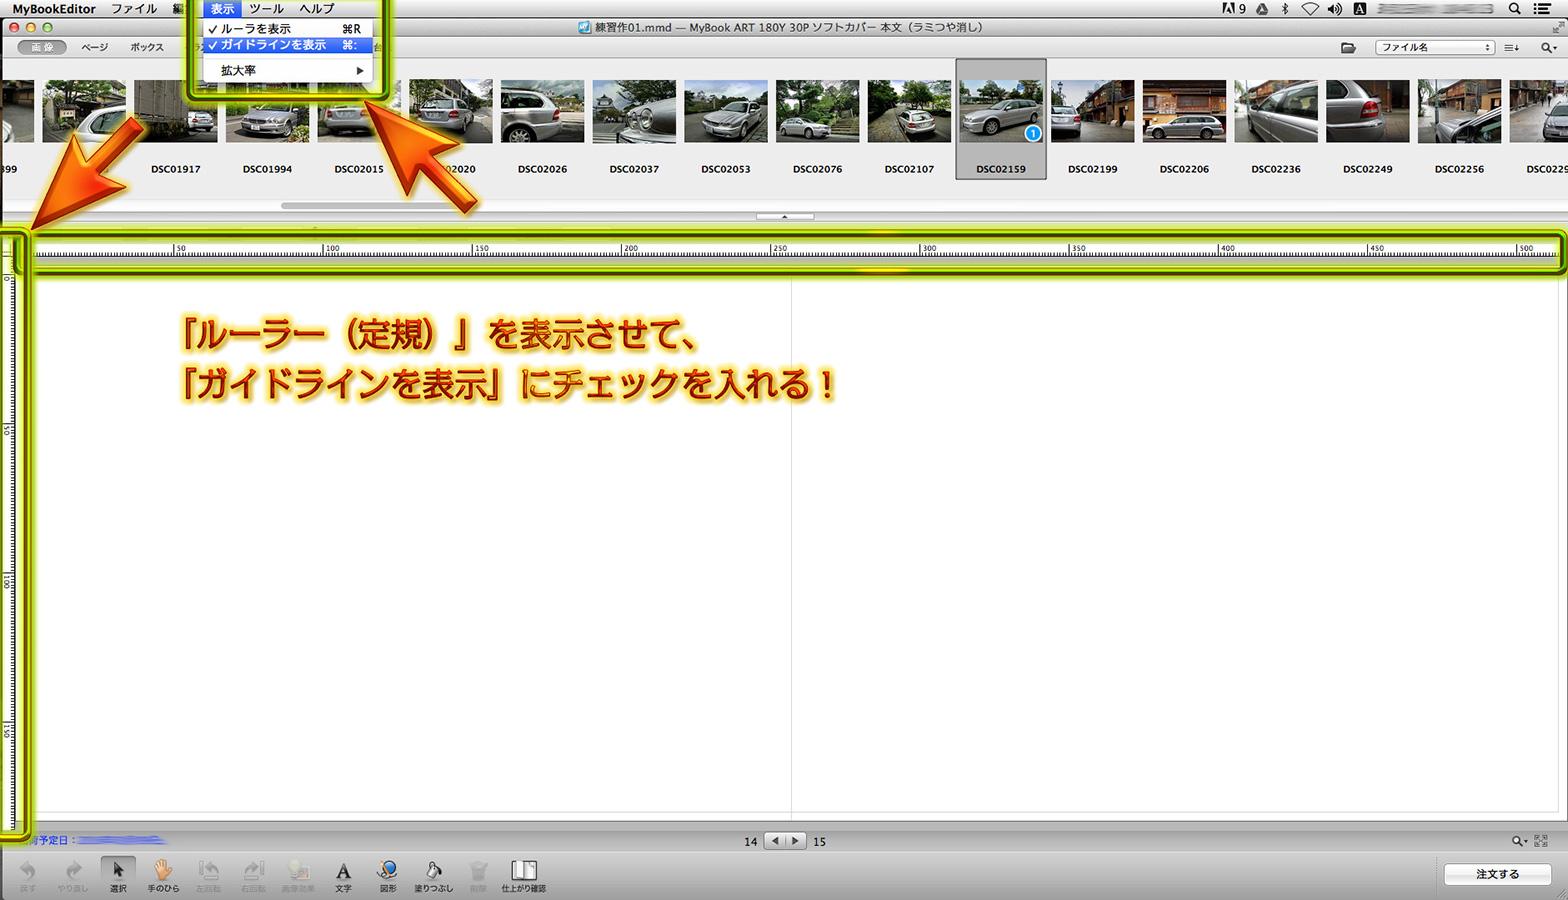 http://moritetsu.info/car/img/mb055-2016-03-02-18-43-13.jpg